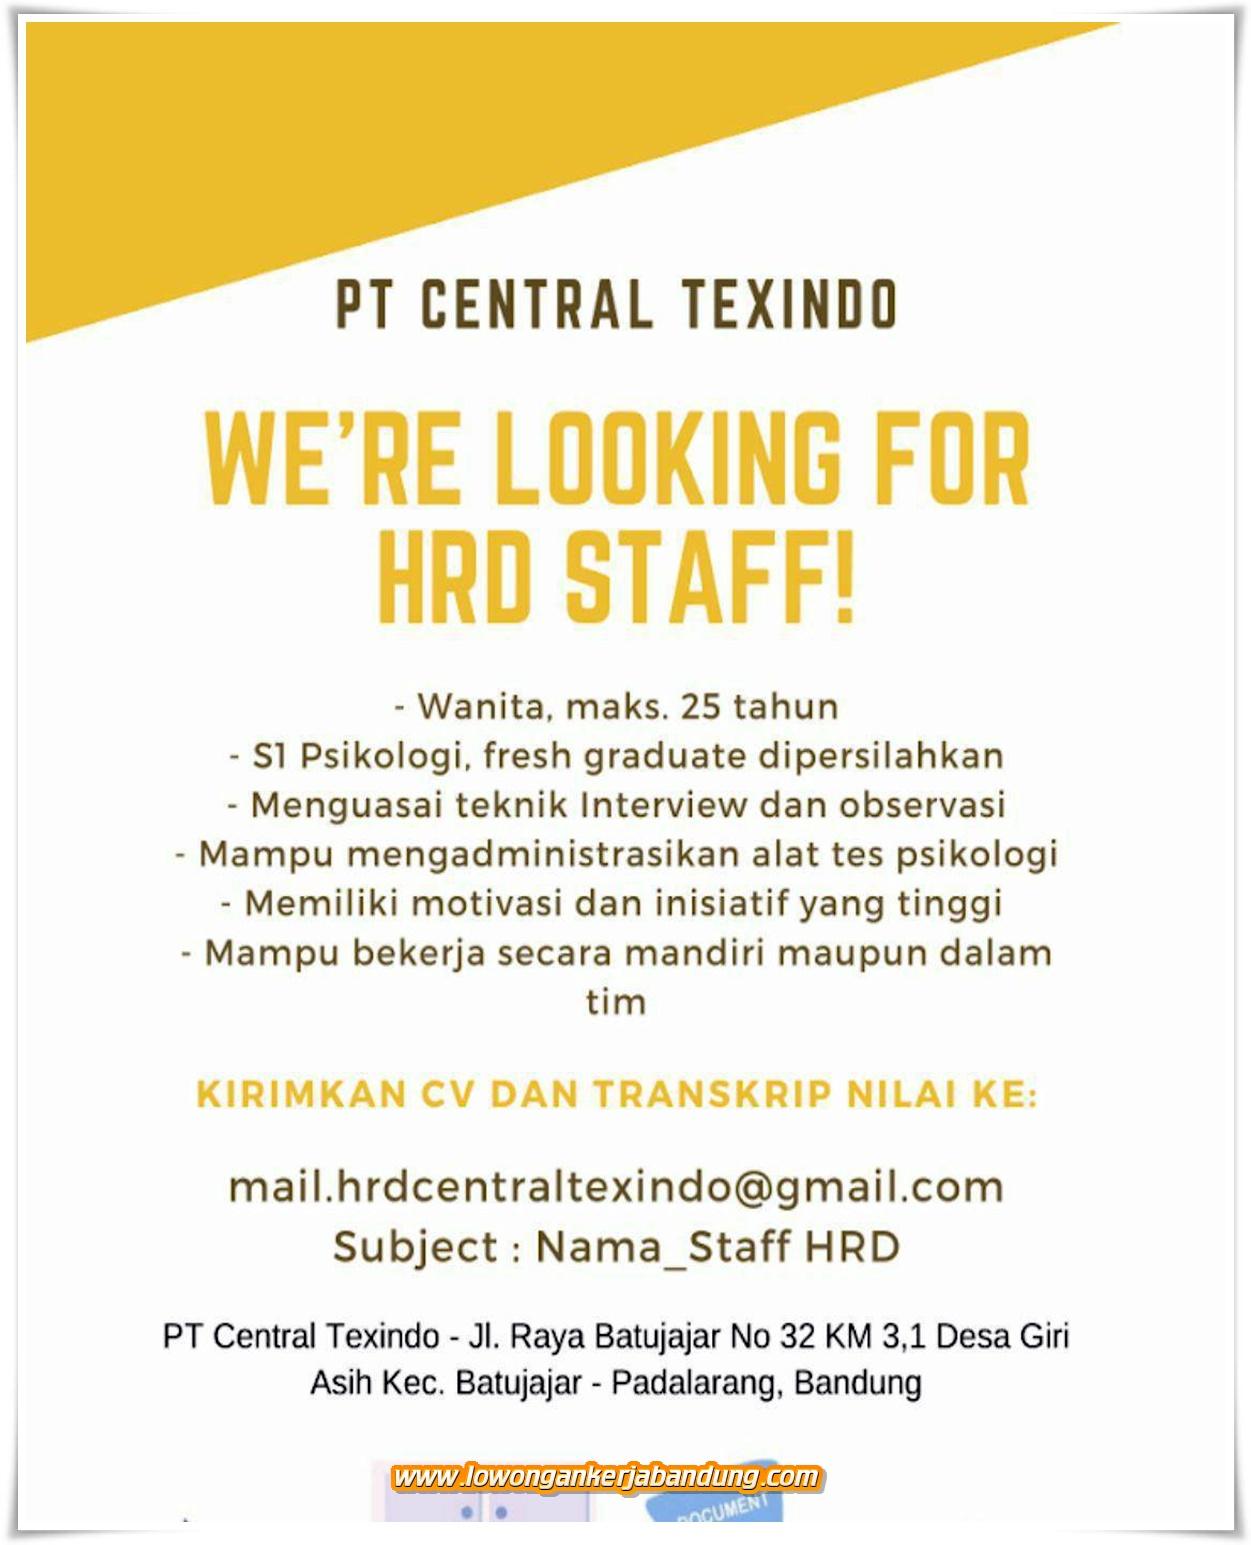 Lowongan Kerja Bandung Staff Hrd Pt Central Texindo